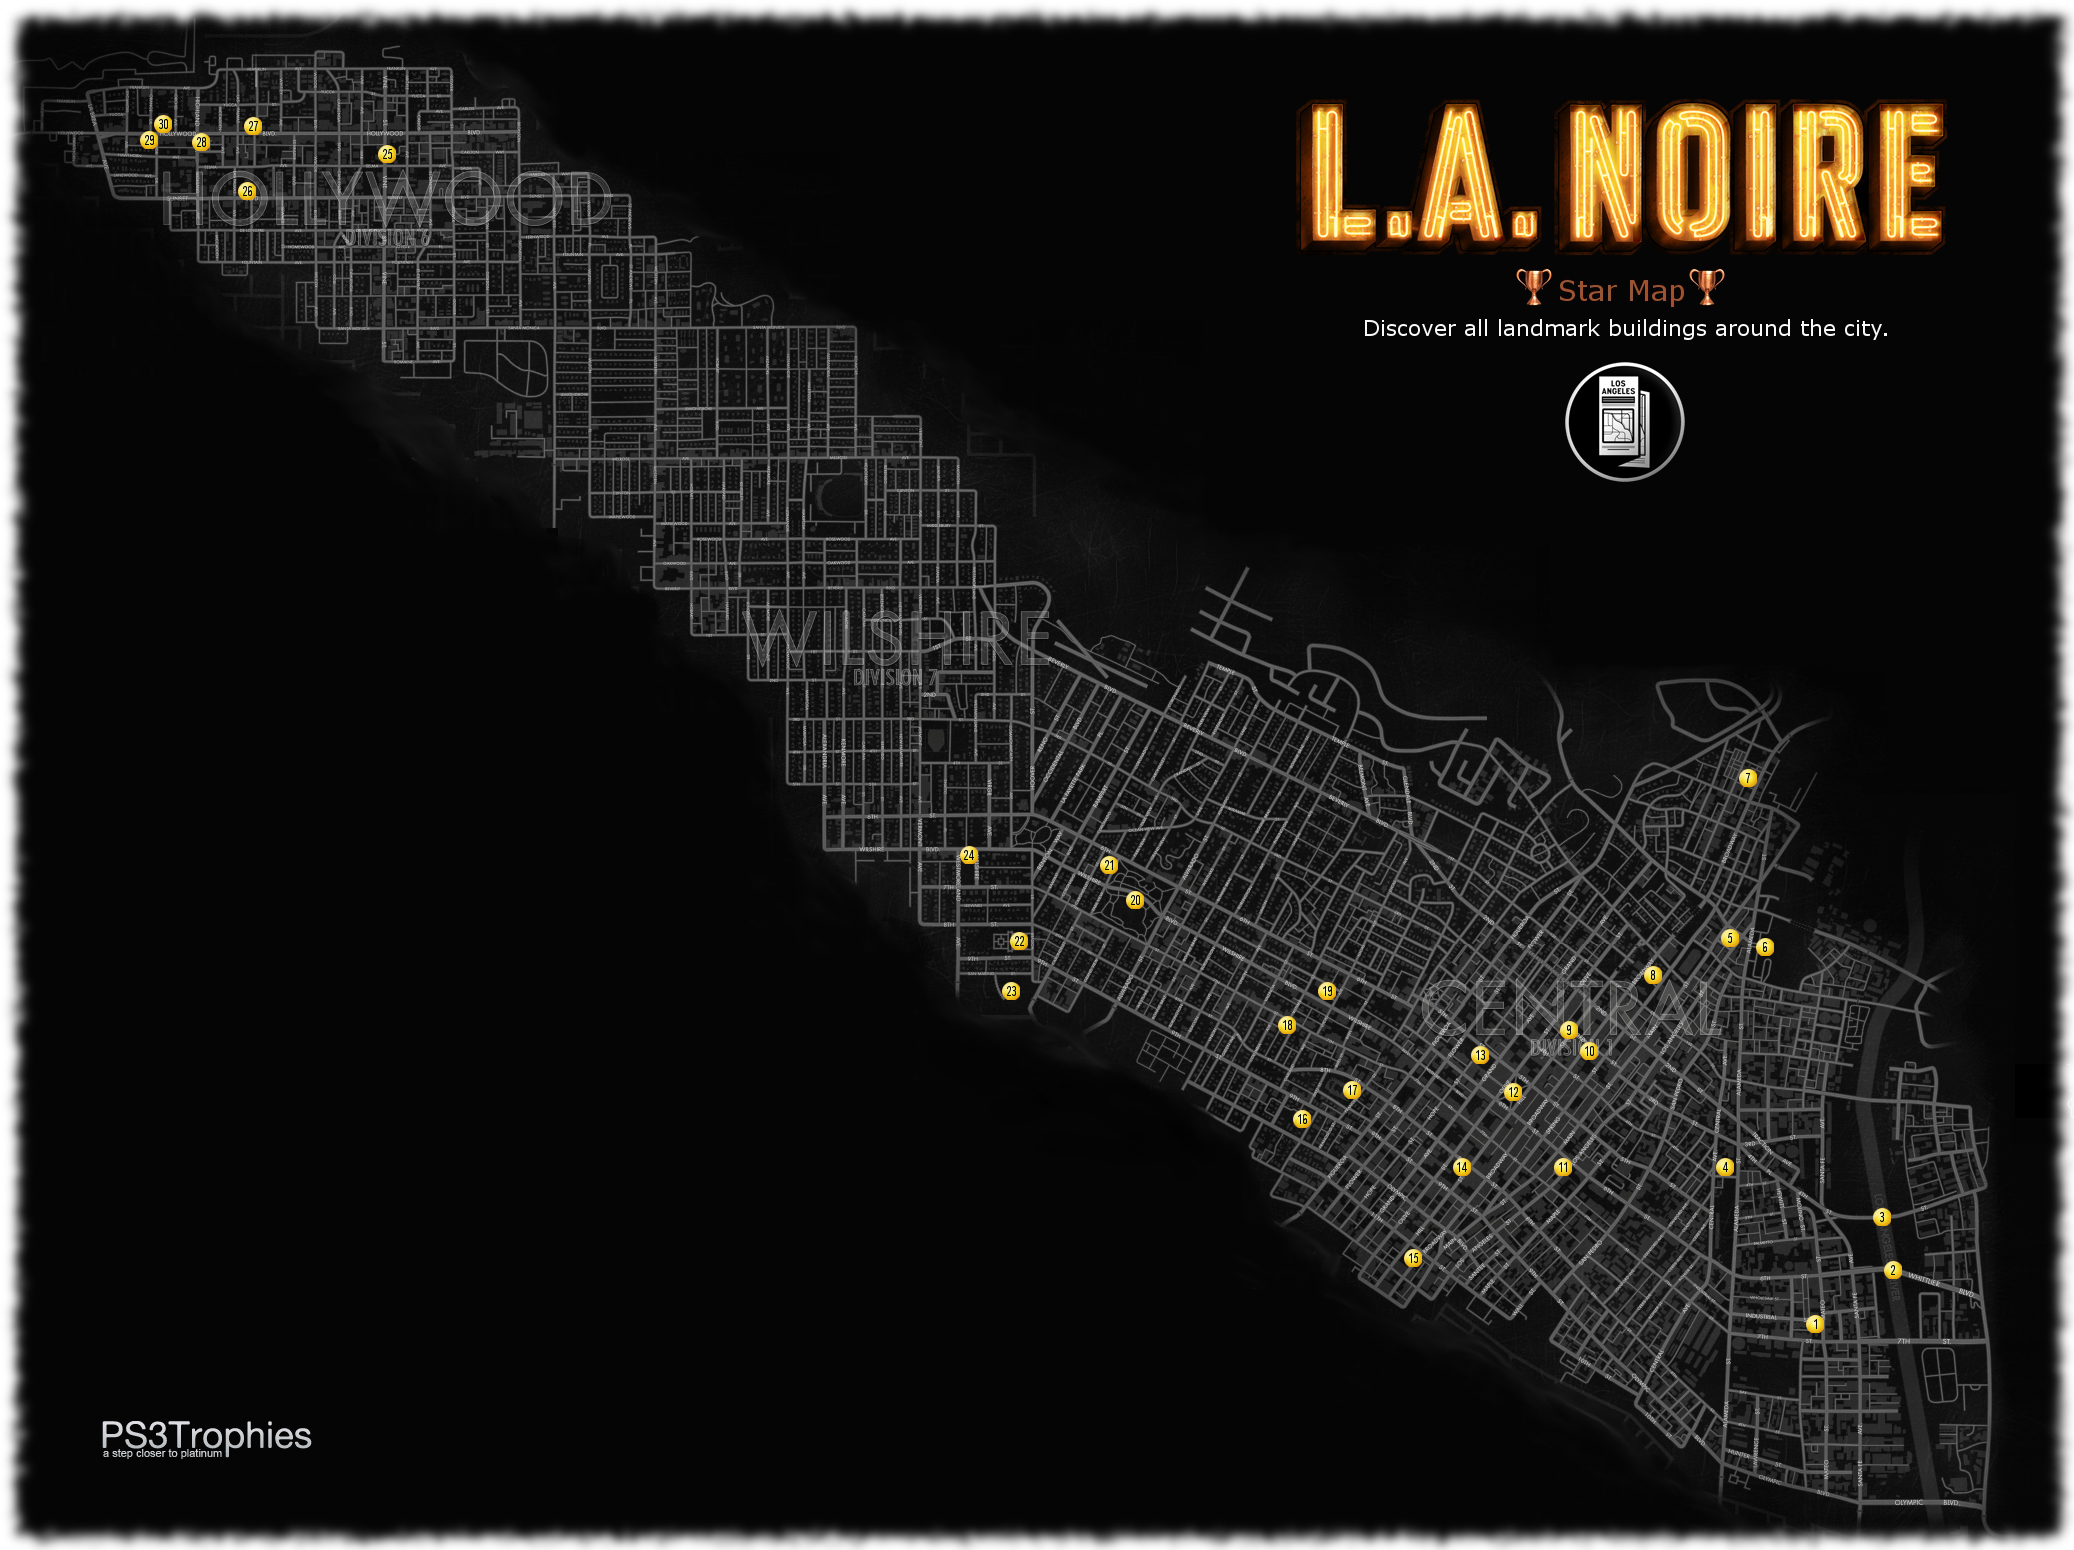 L.A._Noire-Landmarks.jpg